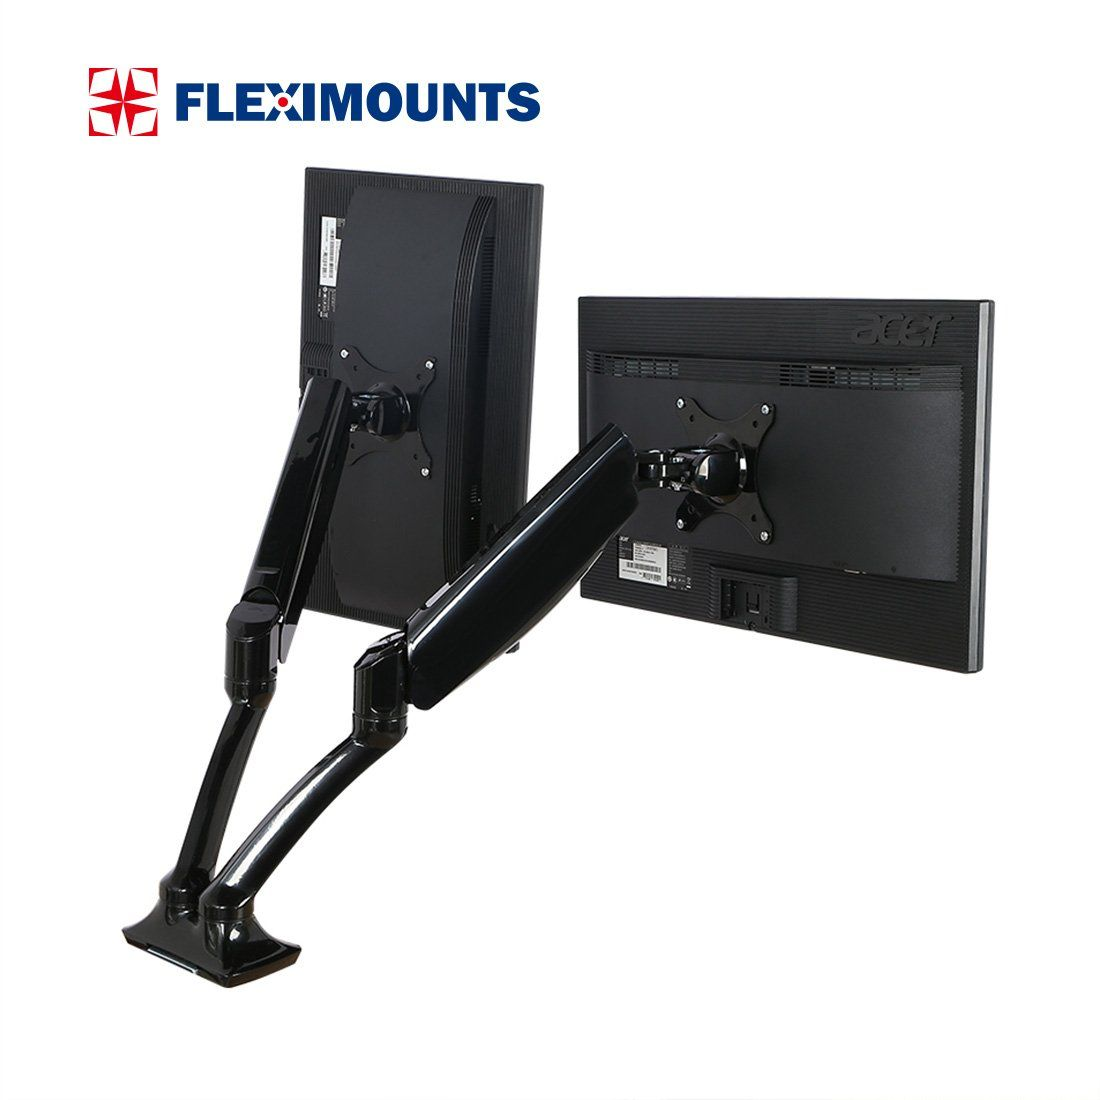 Fleximounts Dual Monitor Mount Lcd Armfull Motion Desk Mounts For